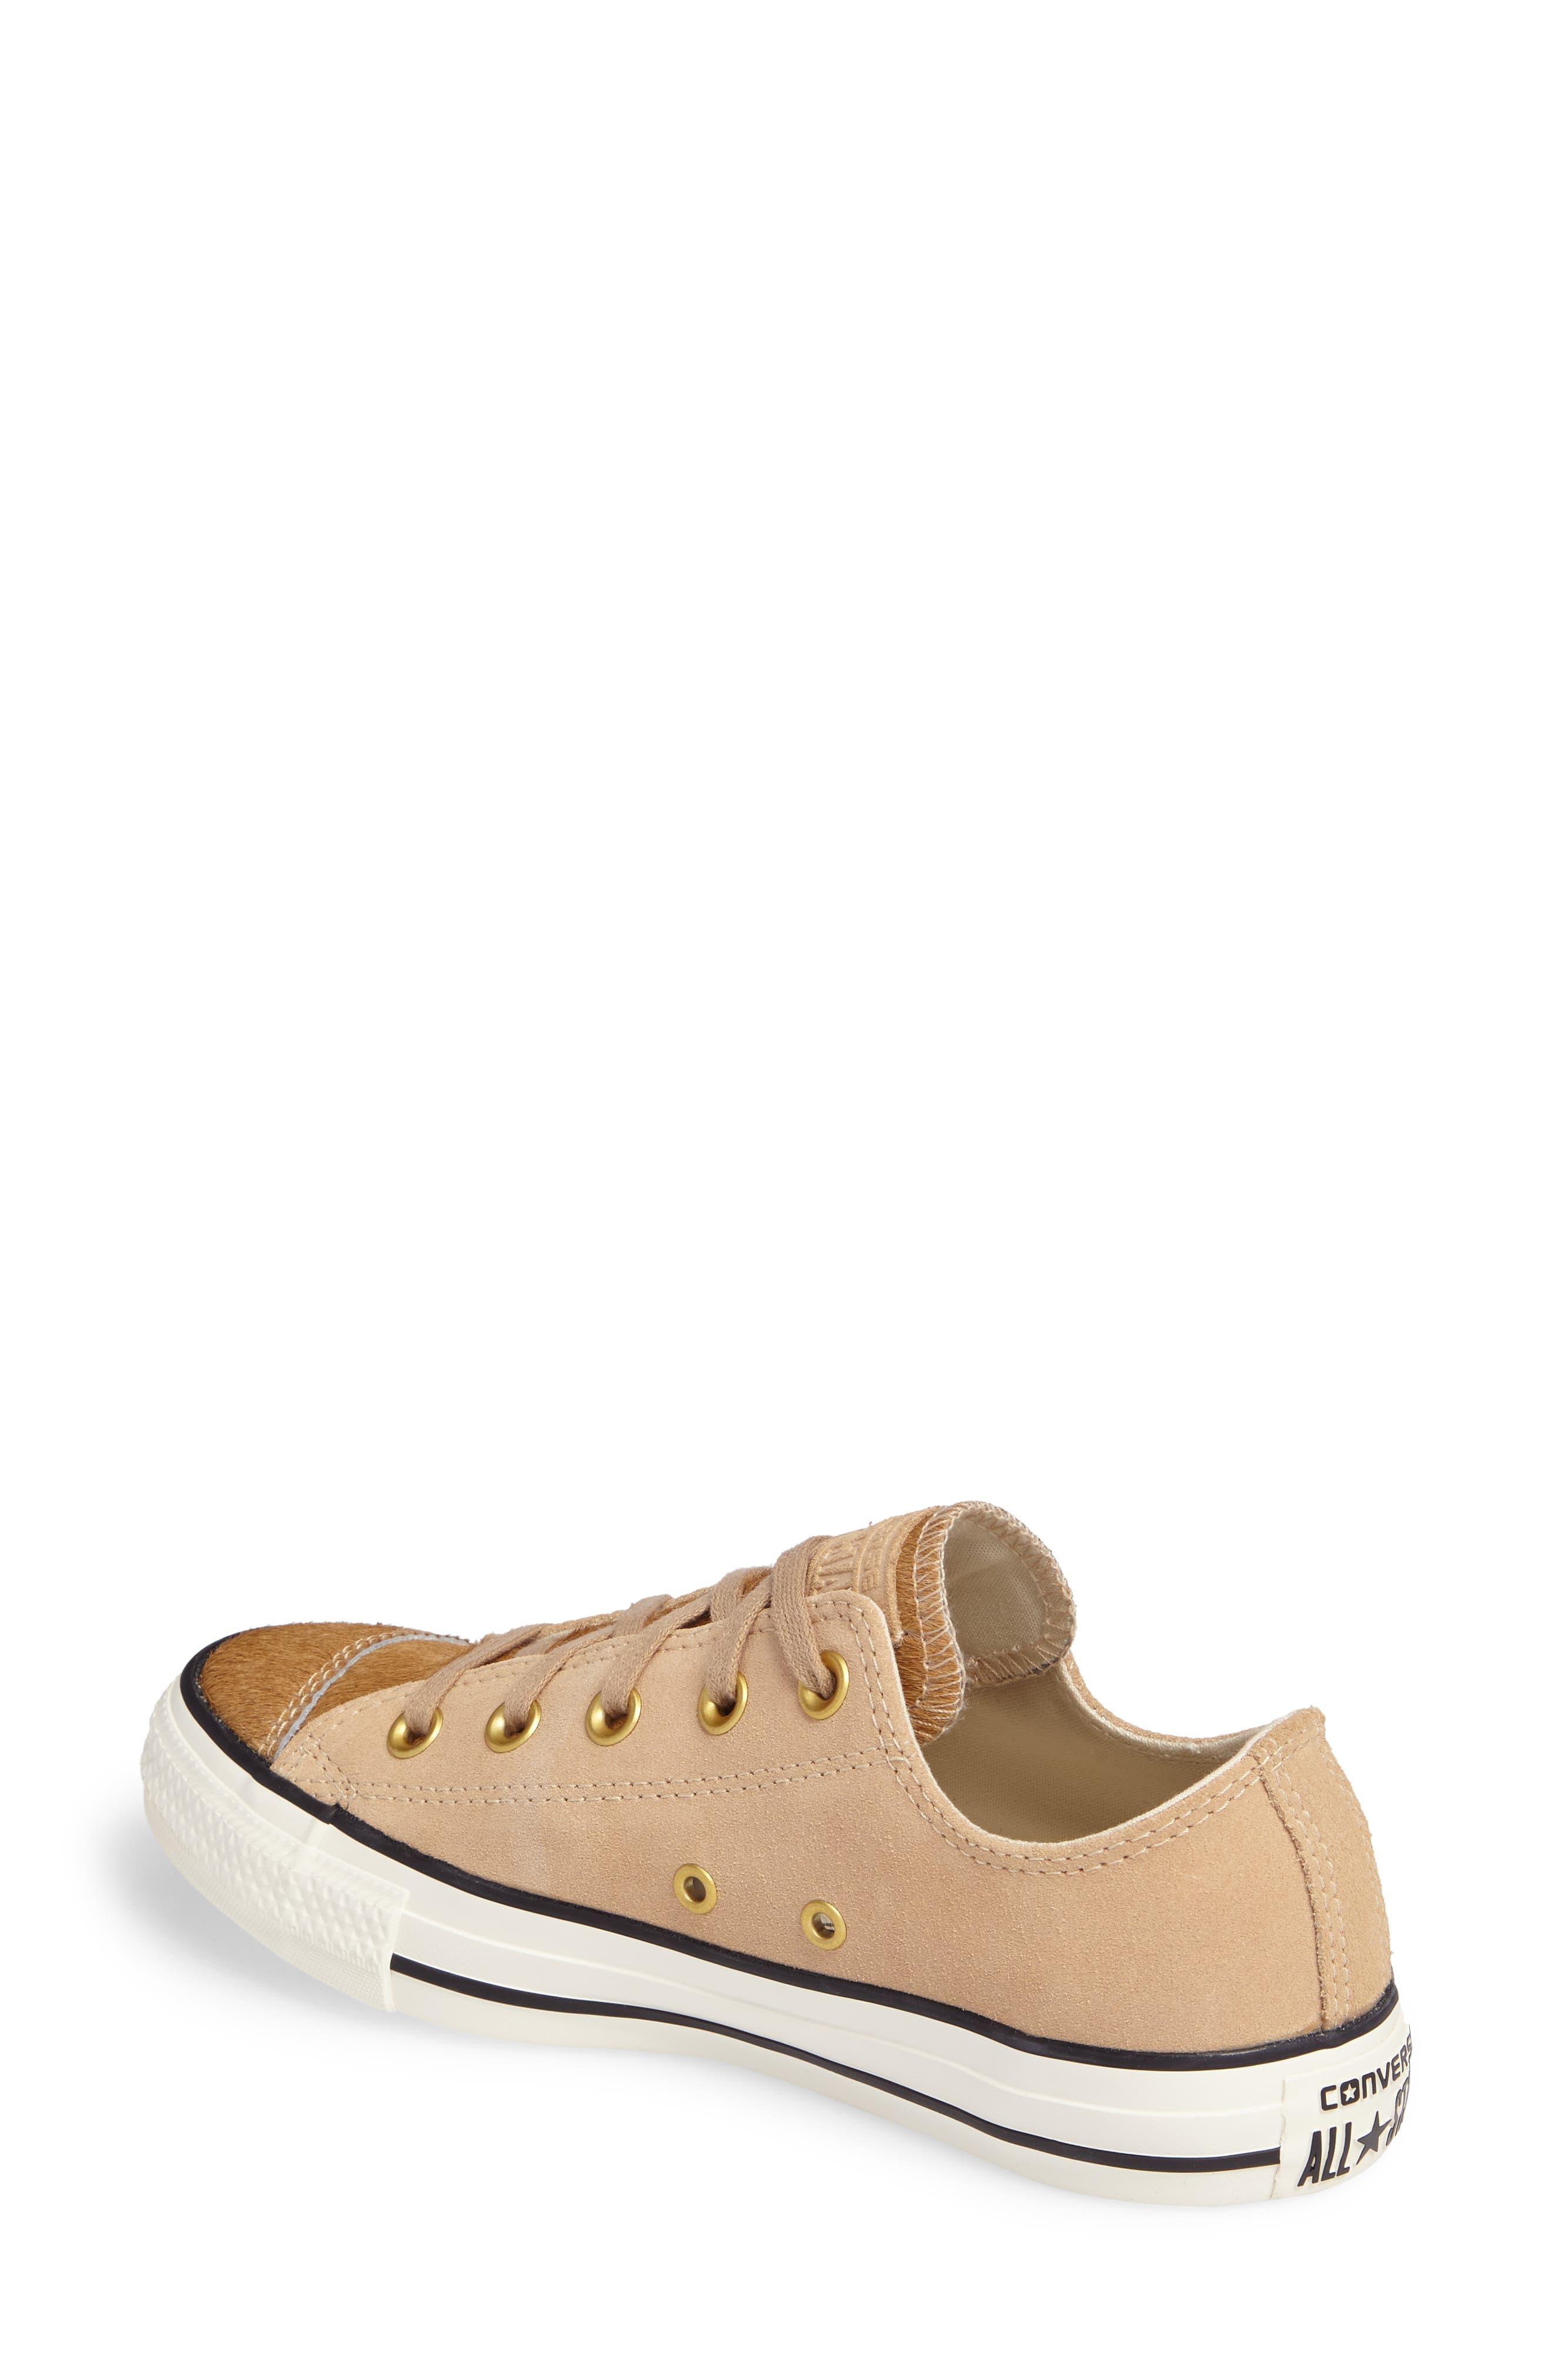 Chuck Taylor<sup>®</sup> All Star<sup>®</sup> Ox Genuine Calf Hair Sneaker,                             Alternate thumbnail 4, color,